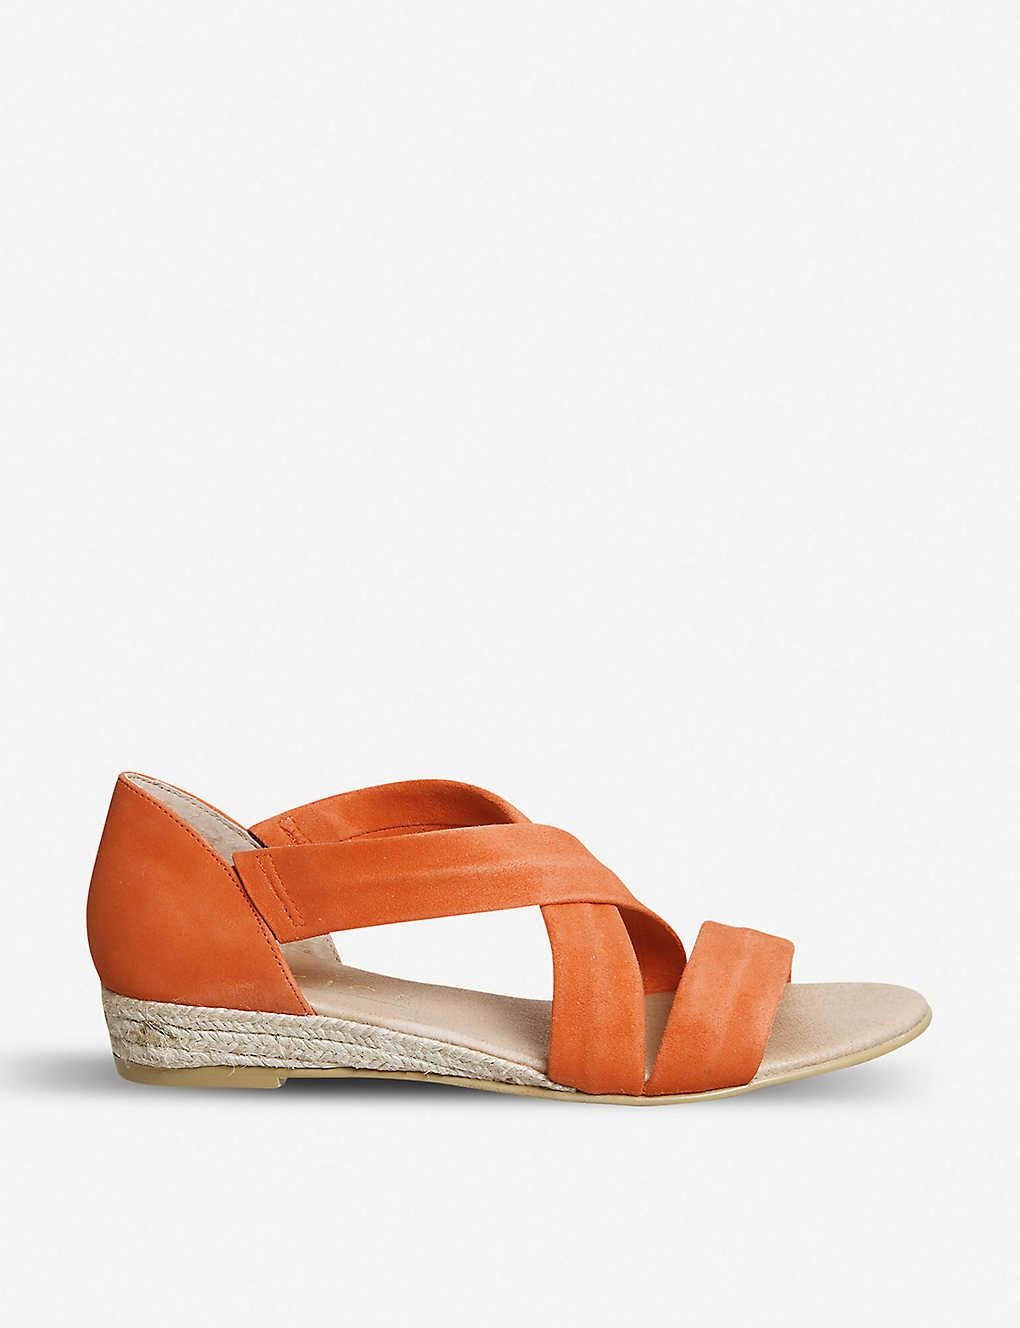 90632521e1e6 OFFICE - Hallie cross-over strap espadrille suede sandals ...